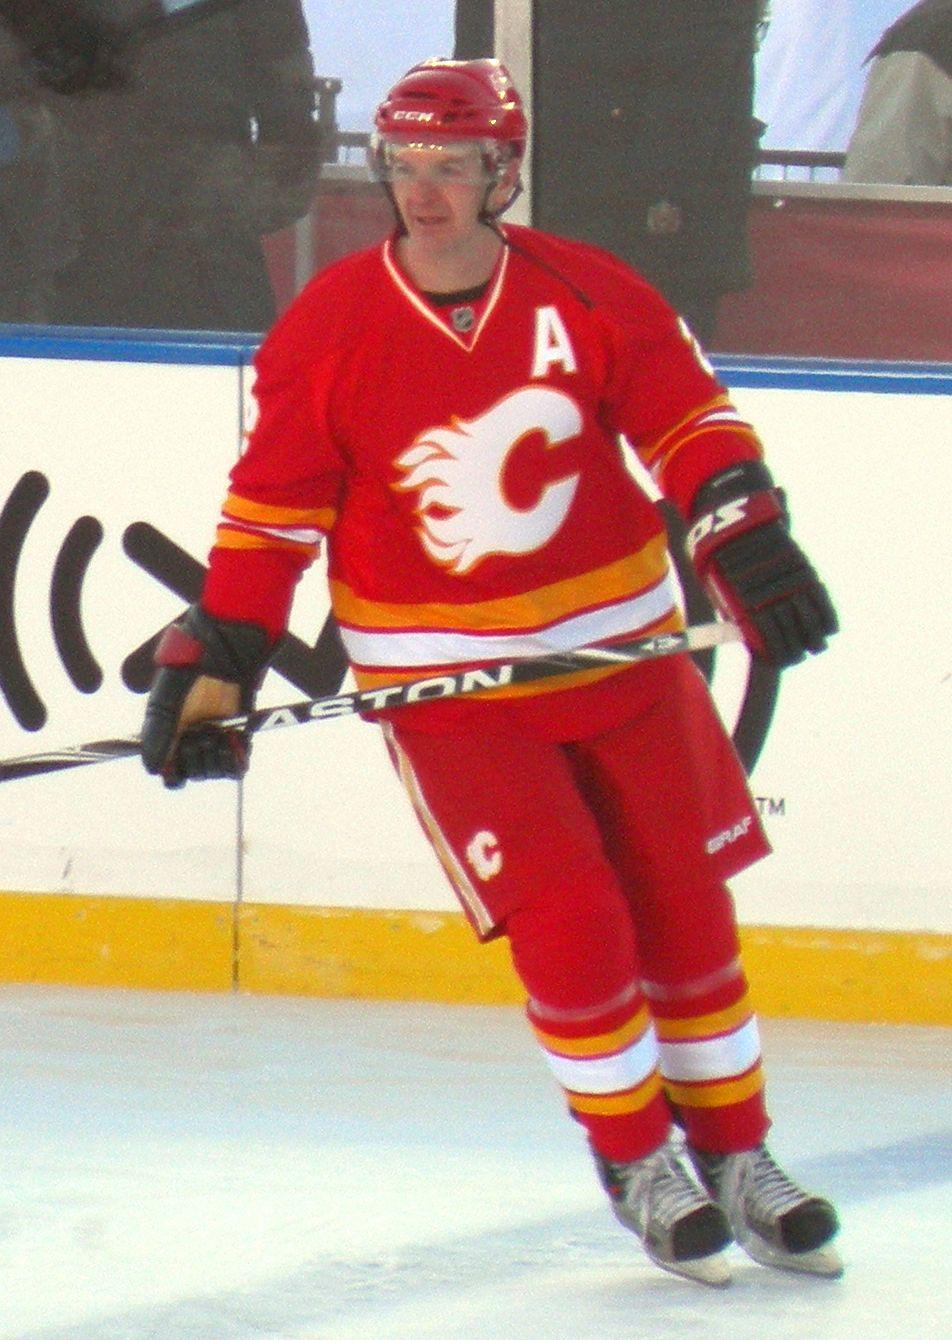 Pin by Wayne Branam on National Hockey League in 2020